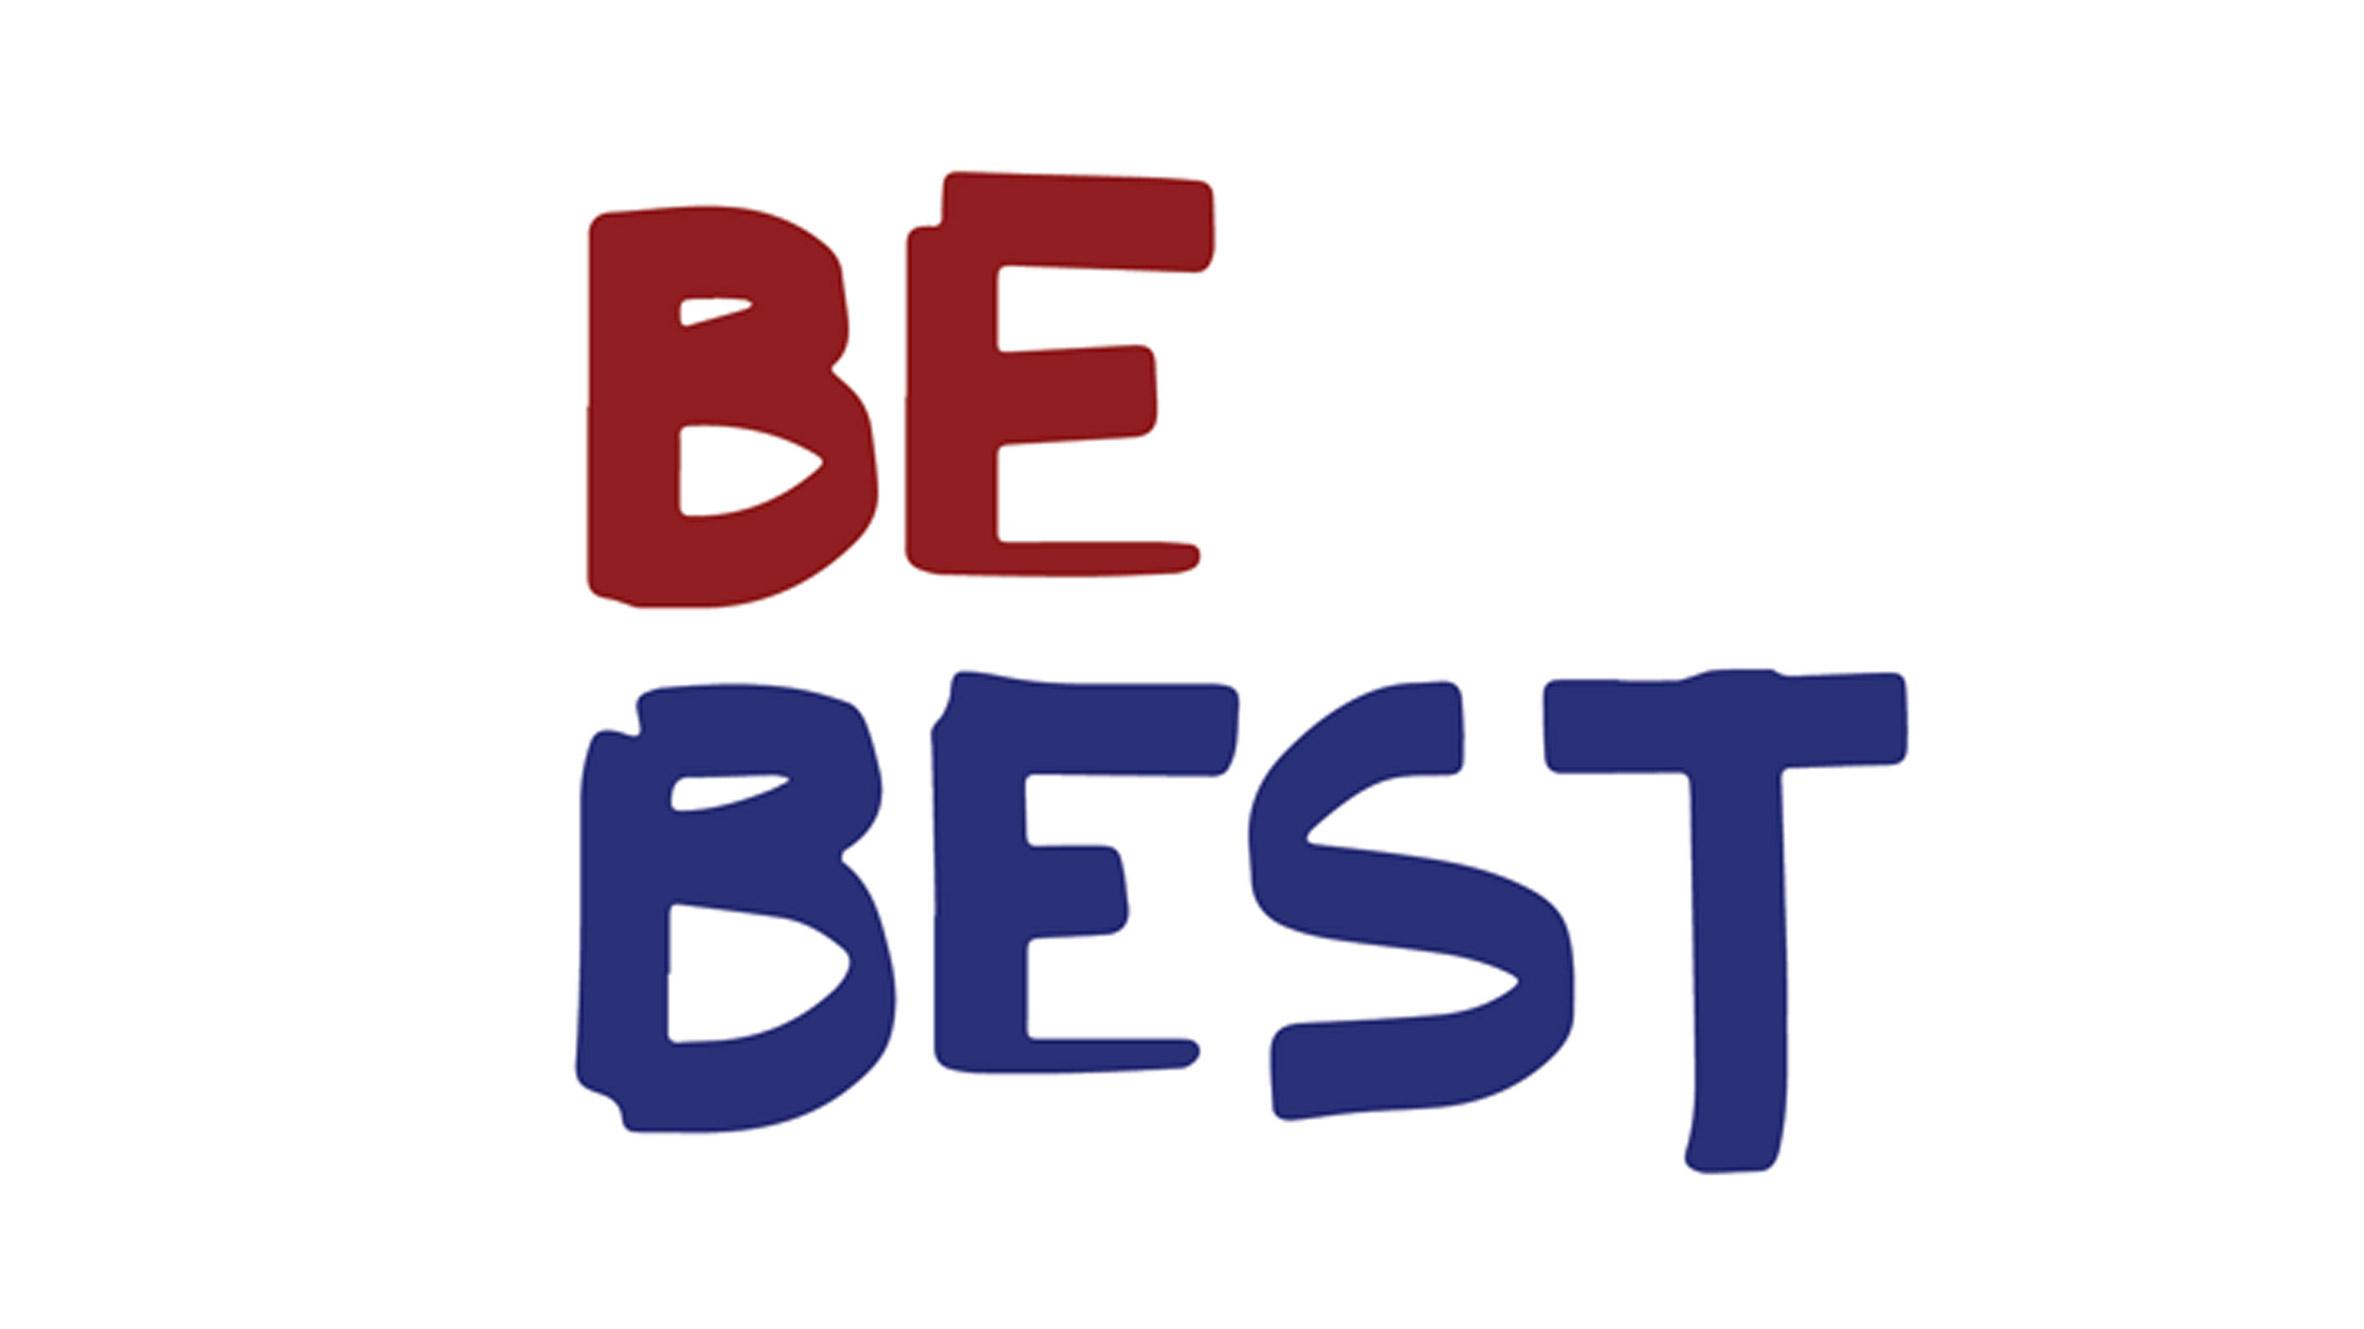 melania trump designs logo for her be best children s initiative